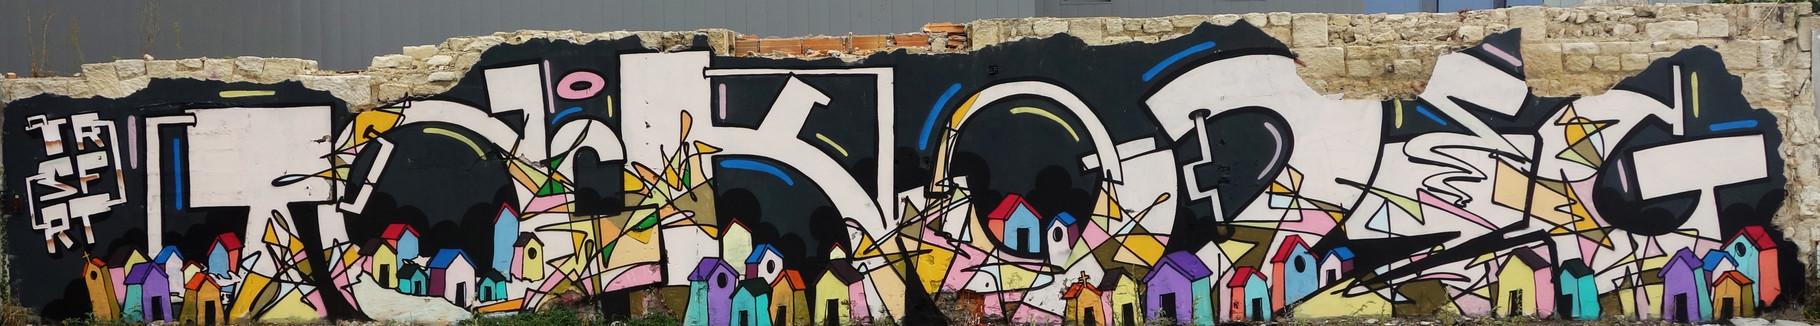 Odeg-tack, Bordeaux, 2014